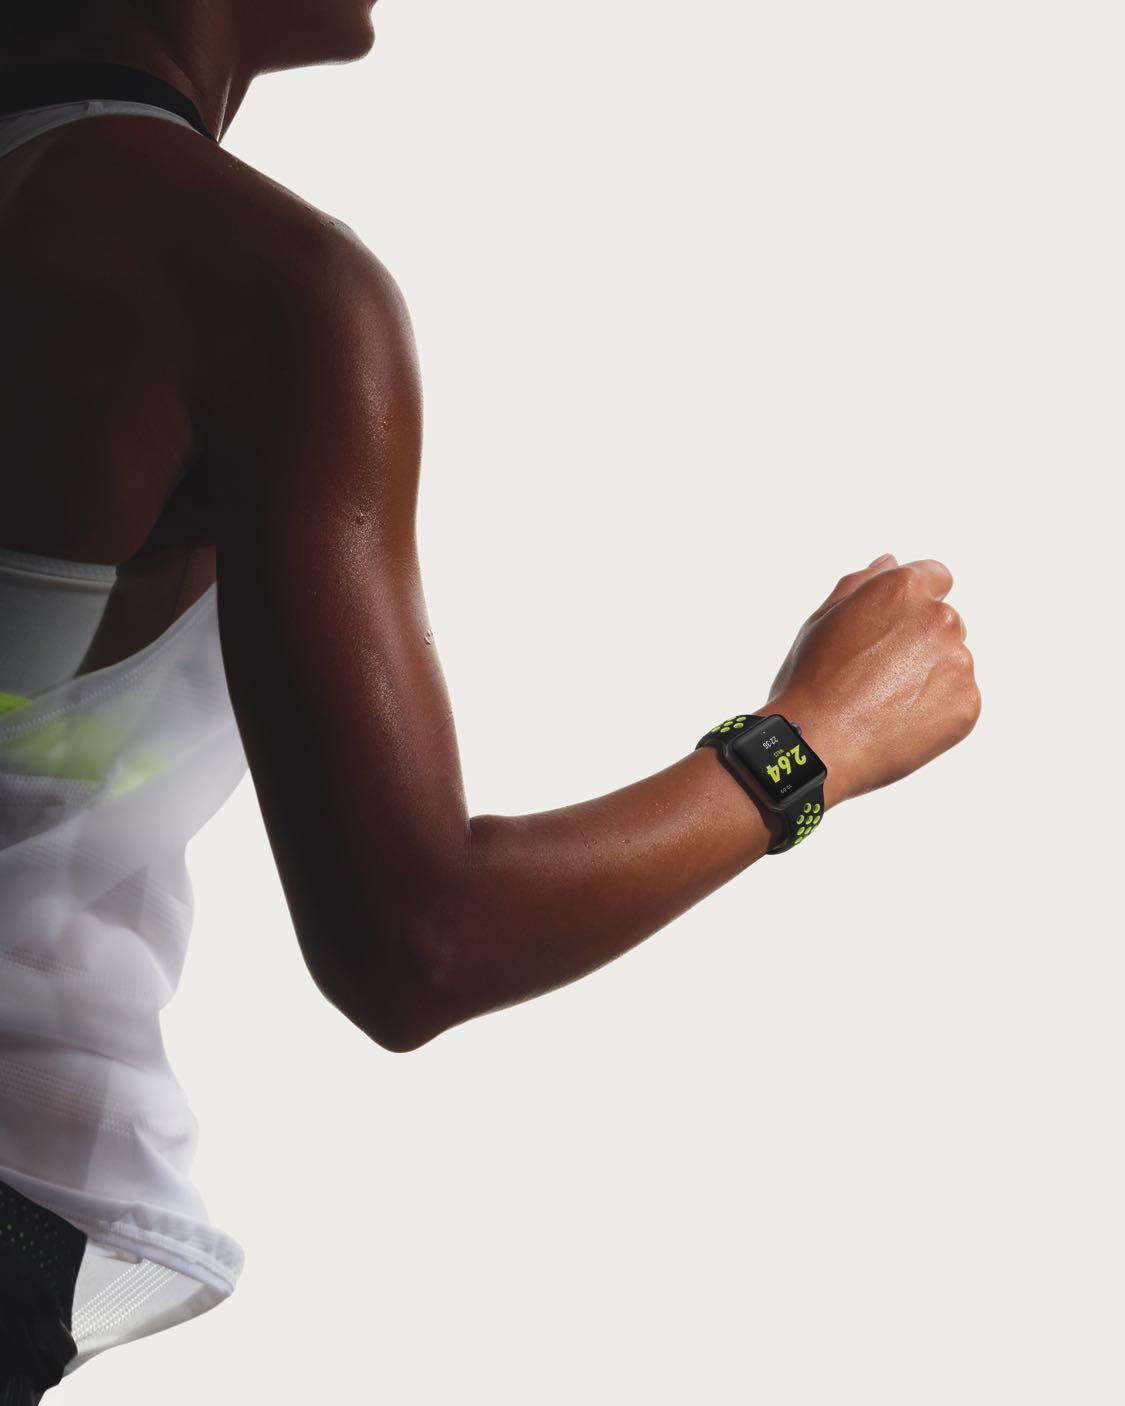 watch-lifestyle-female-runner_pr-print